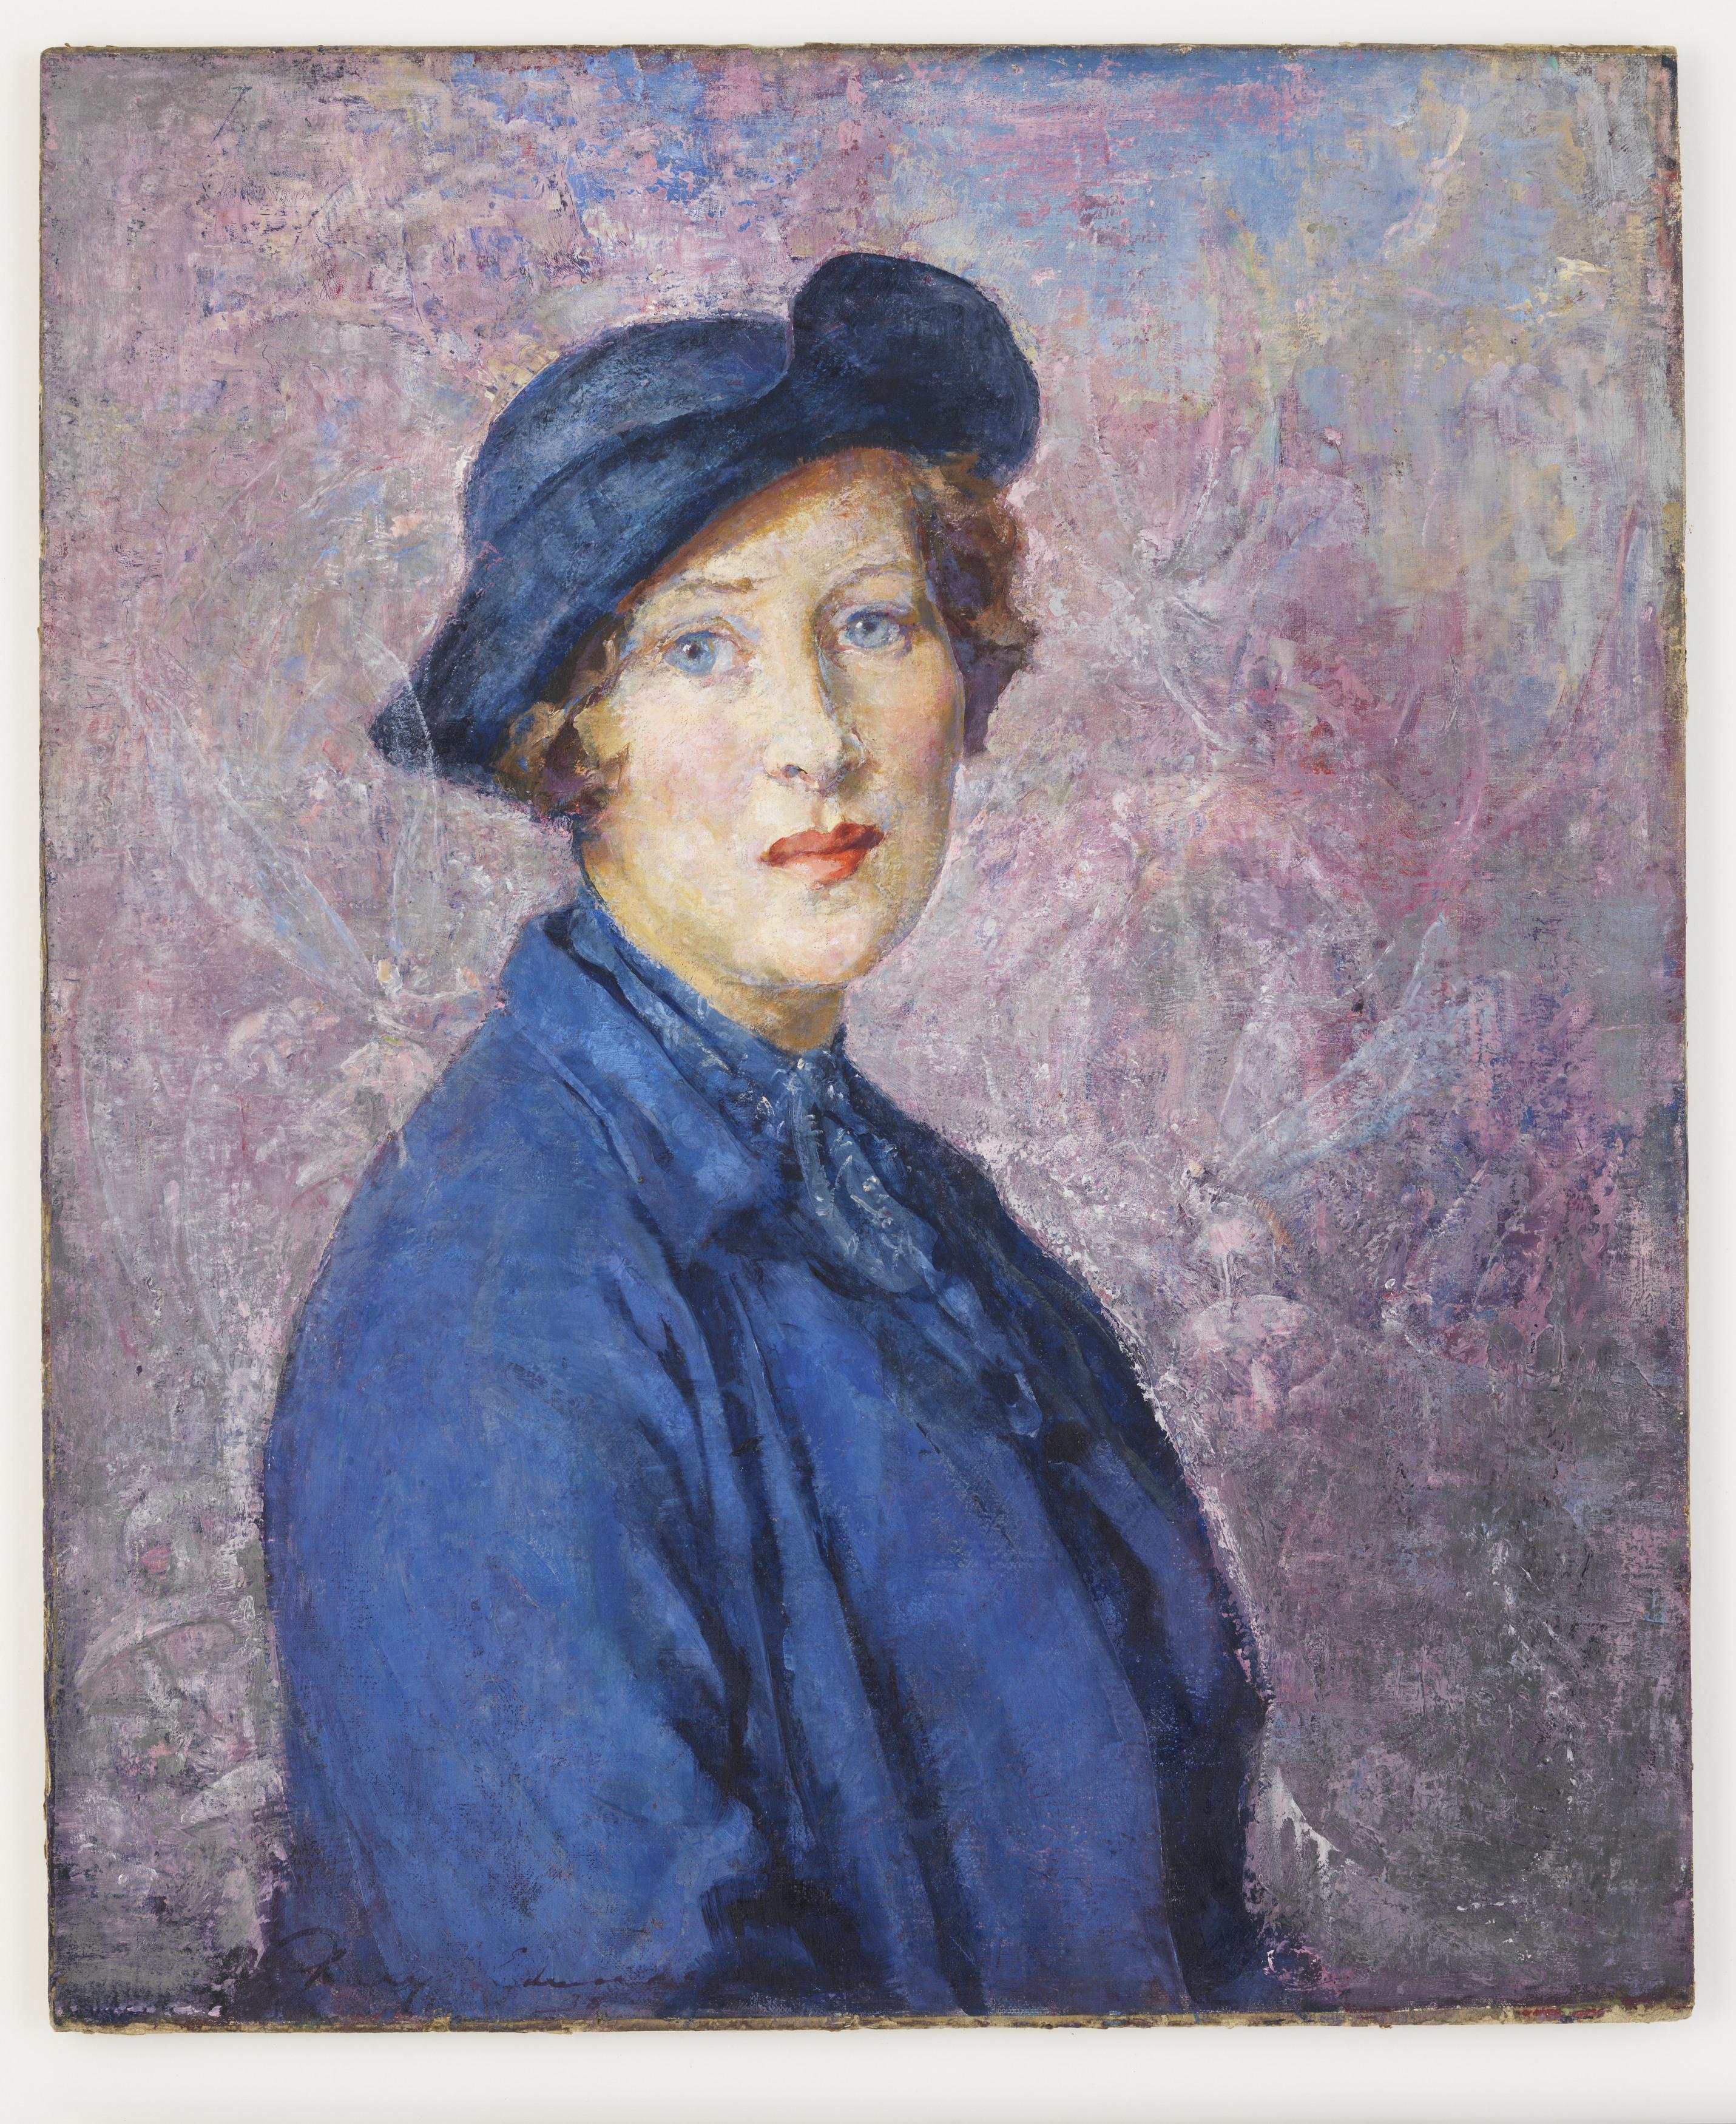 Painted portrait of Pixie O'Harris.